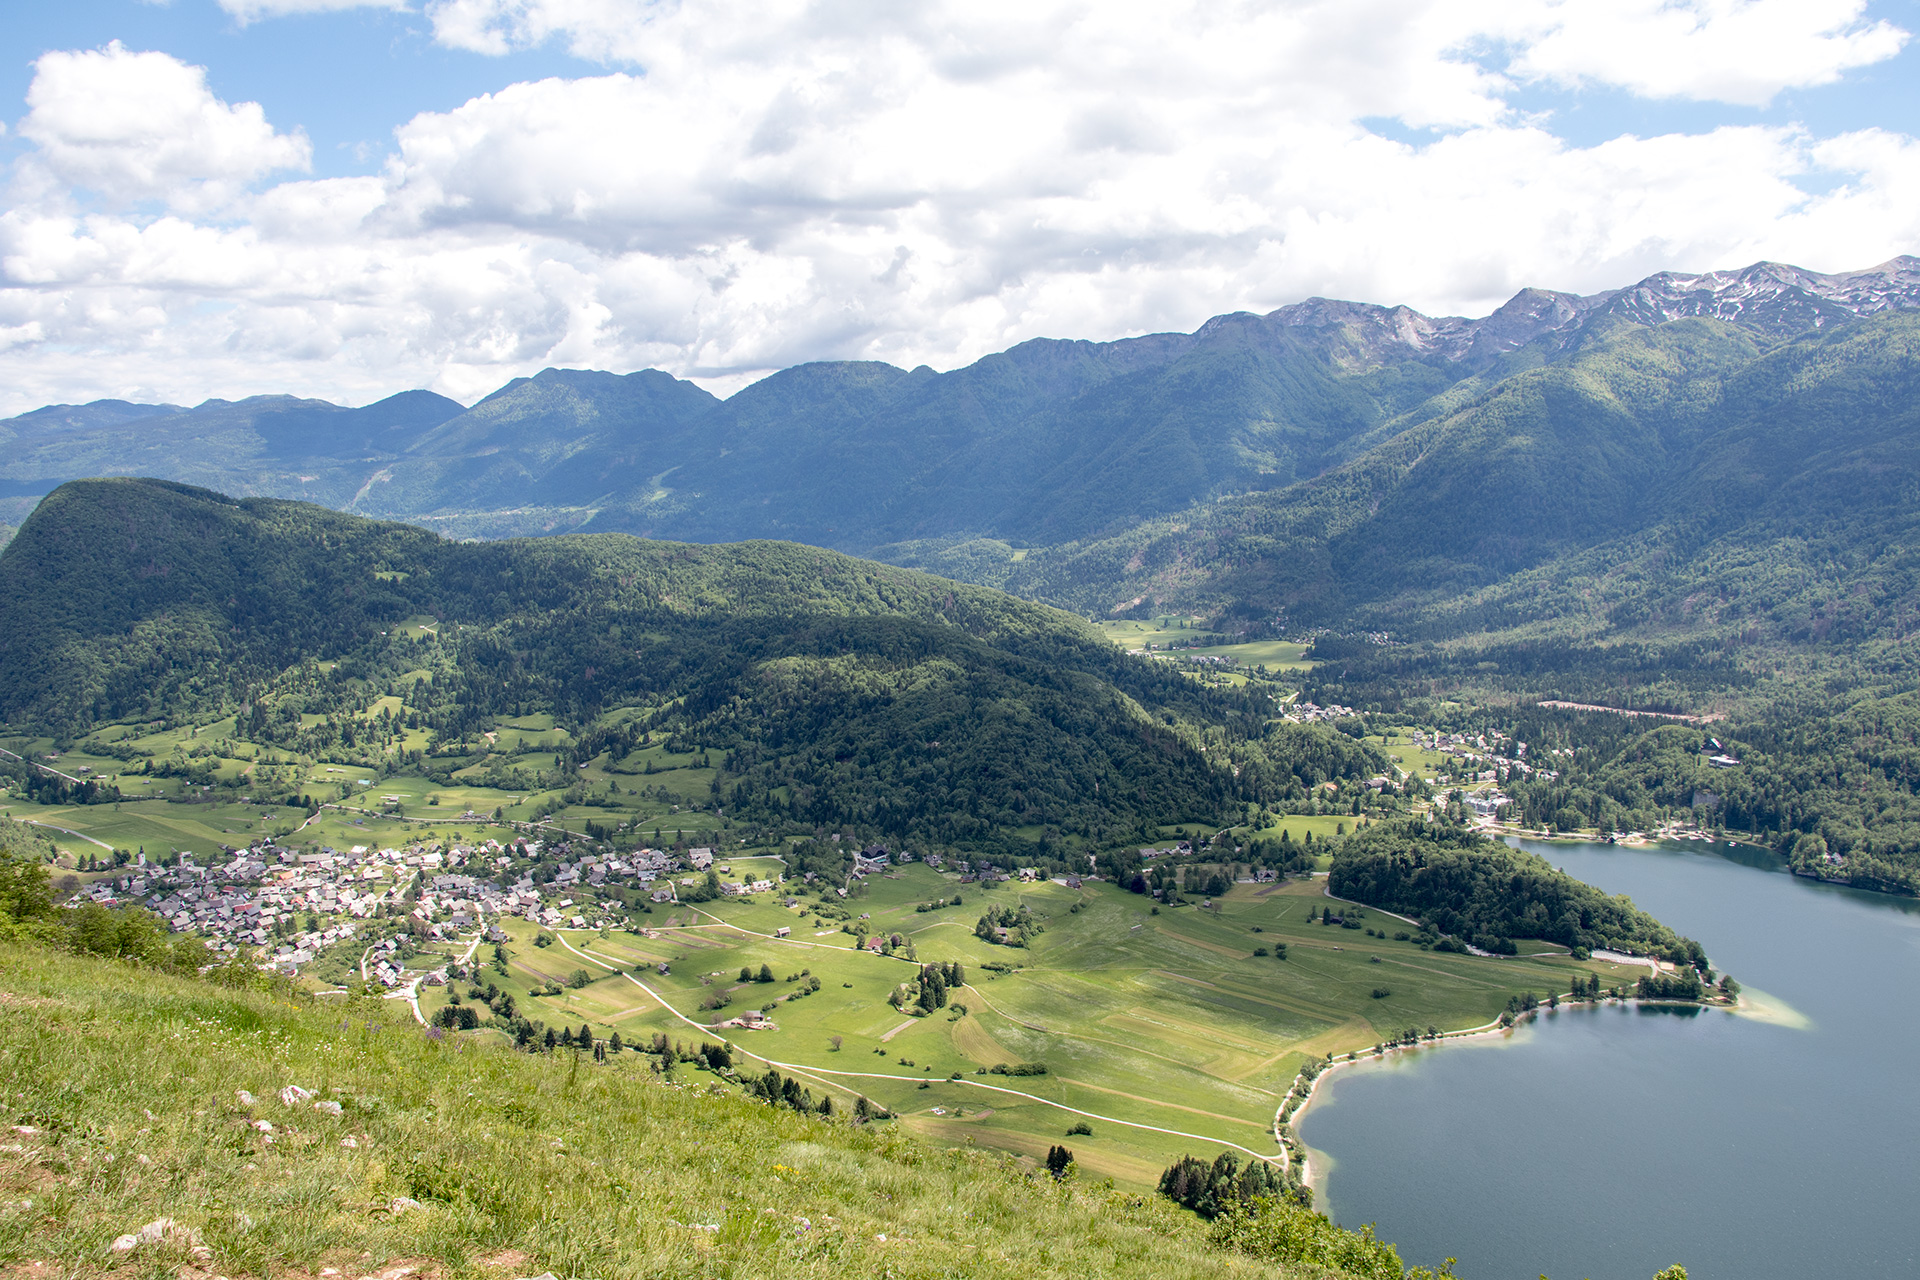 Stara Fuzina and Bohinjsko Jezero from above